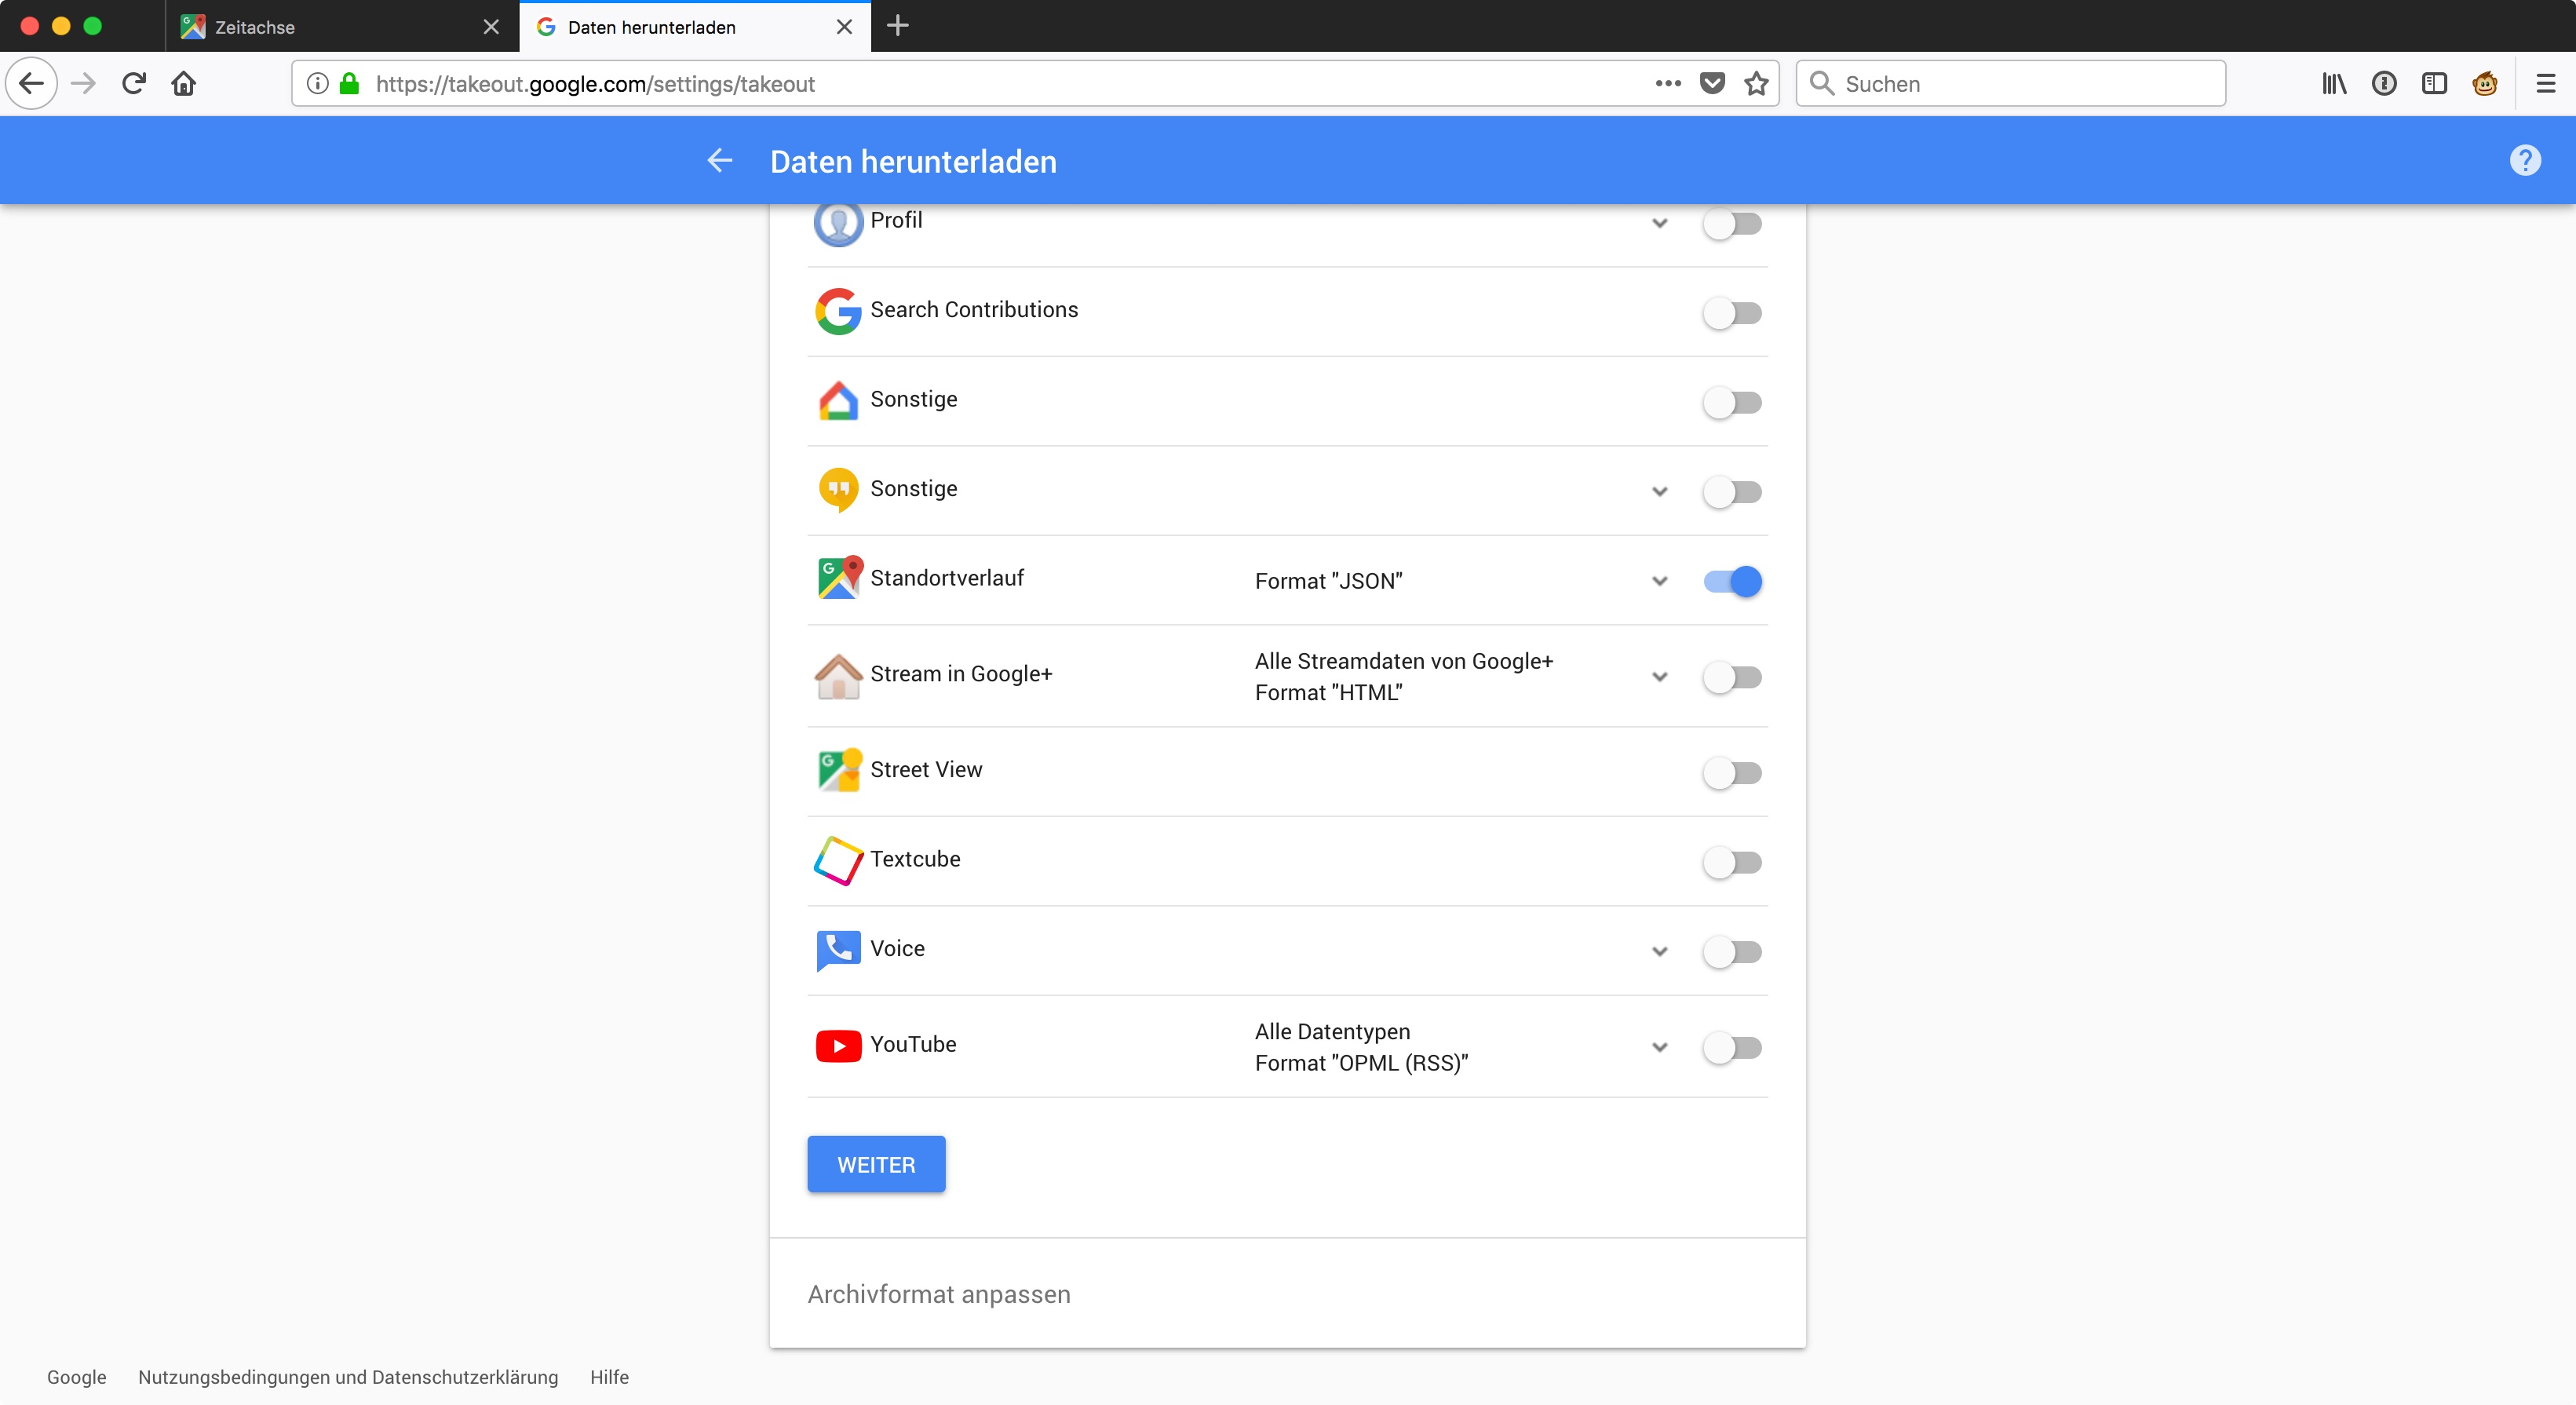 Takeout.google.com